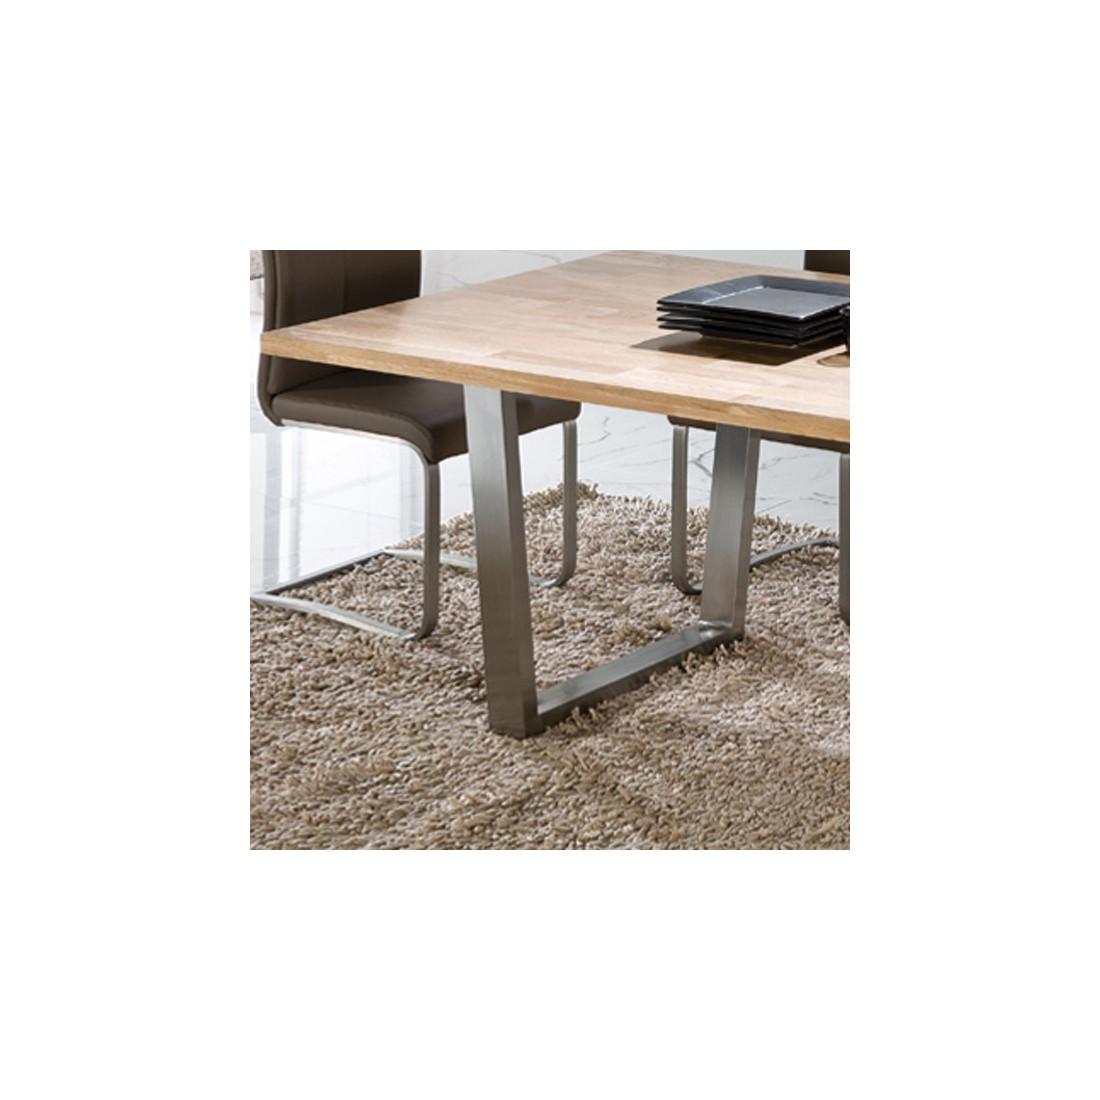 table de repas ch ne massif et inox steph univers salle manger. Black Bedroom Furniture Sets. Home Design Ideas